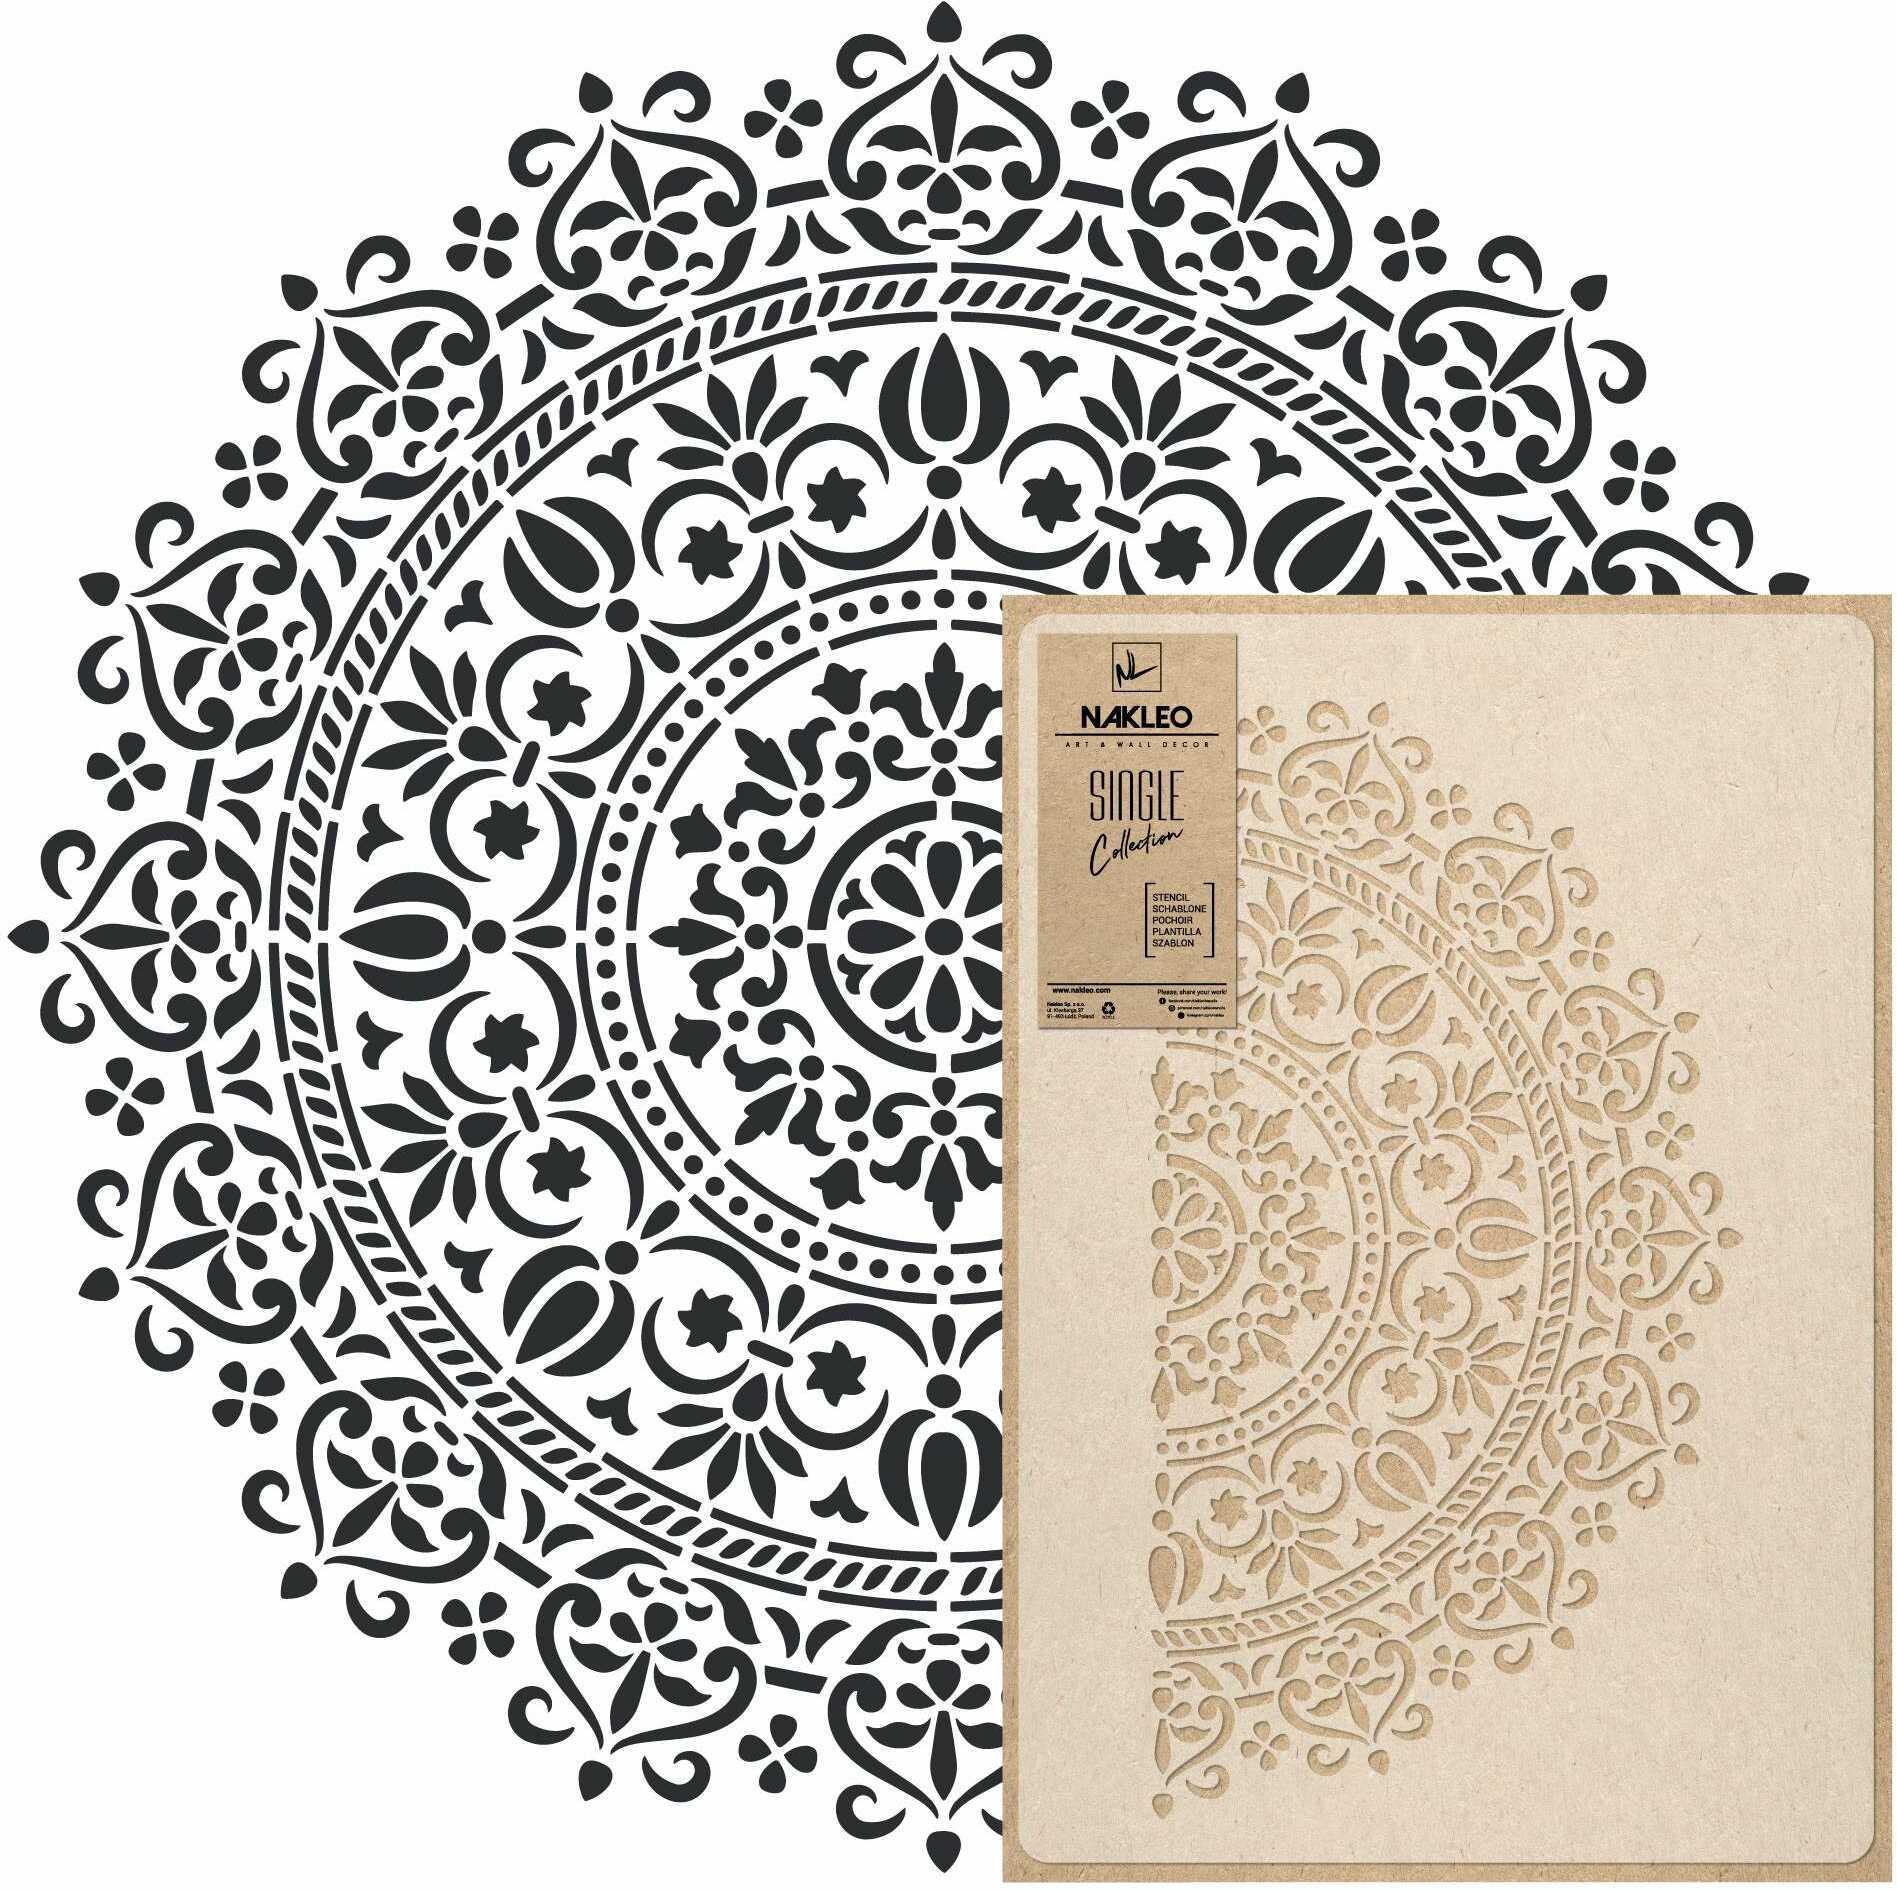 szablon malarski wielokrotny // MANDALA #01 - MEDIUM (45x65cm)